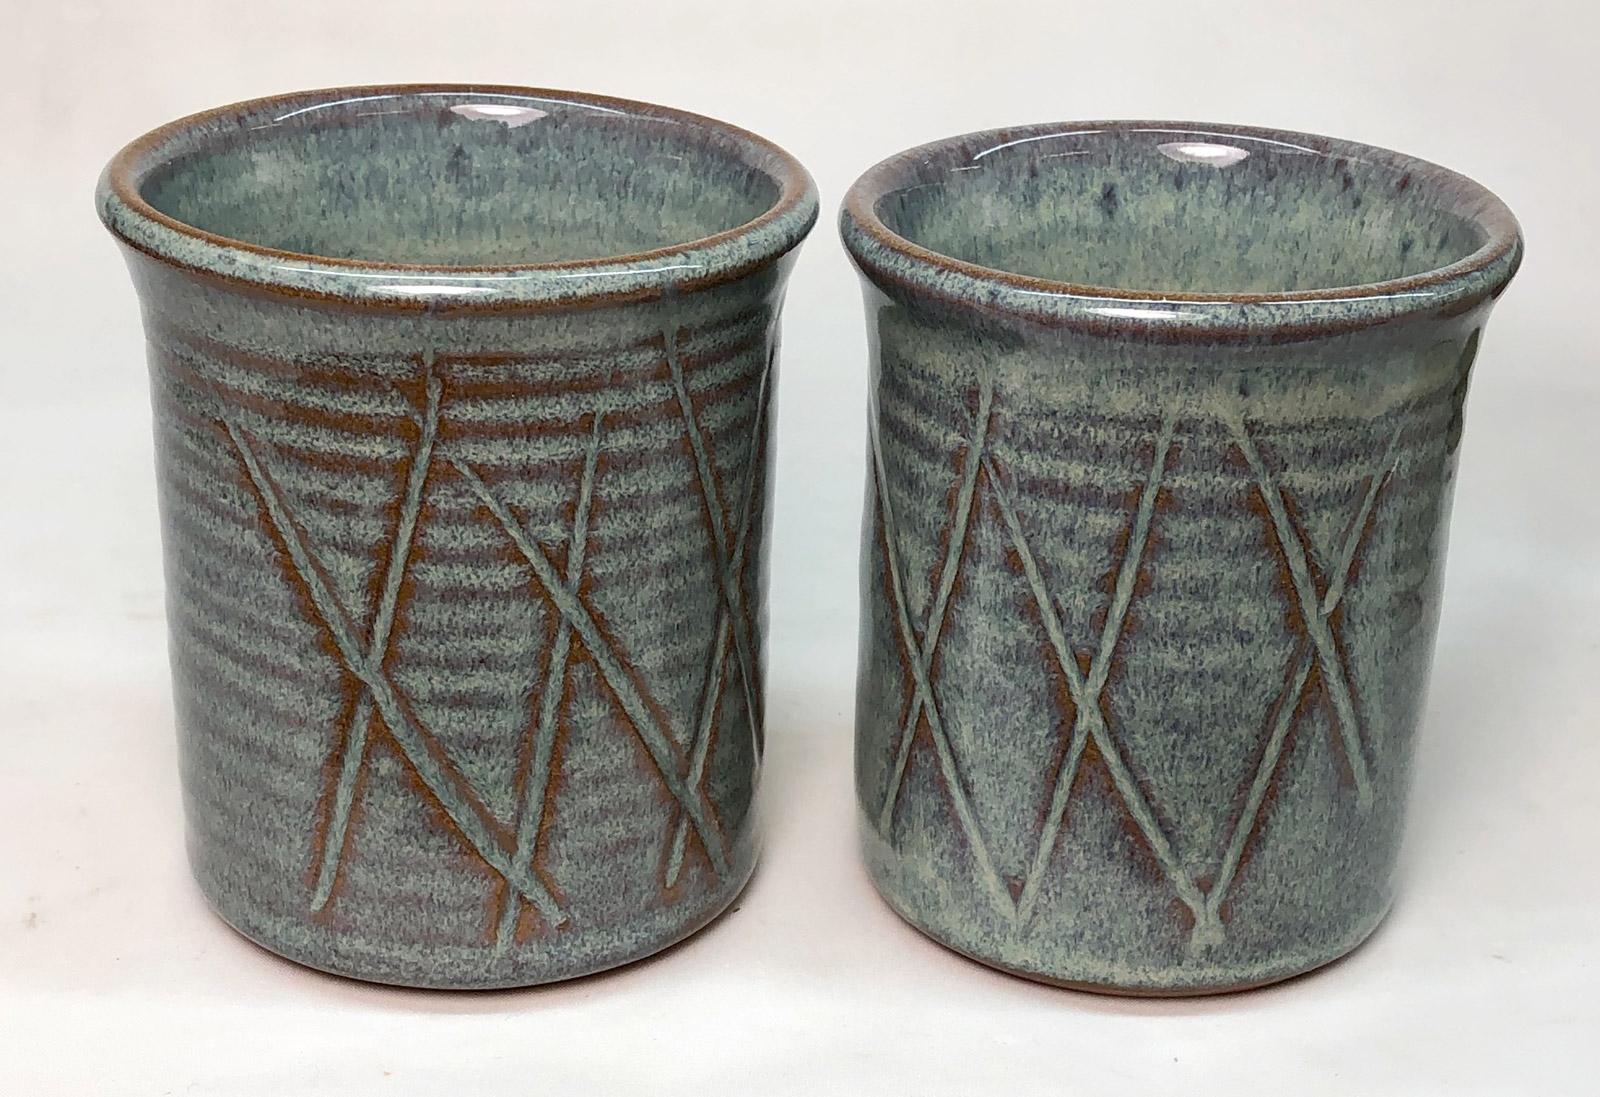 Making your own ceramic rutile